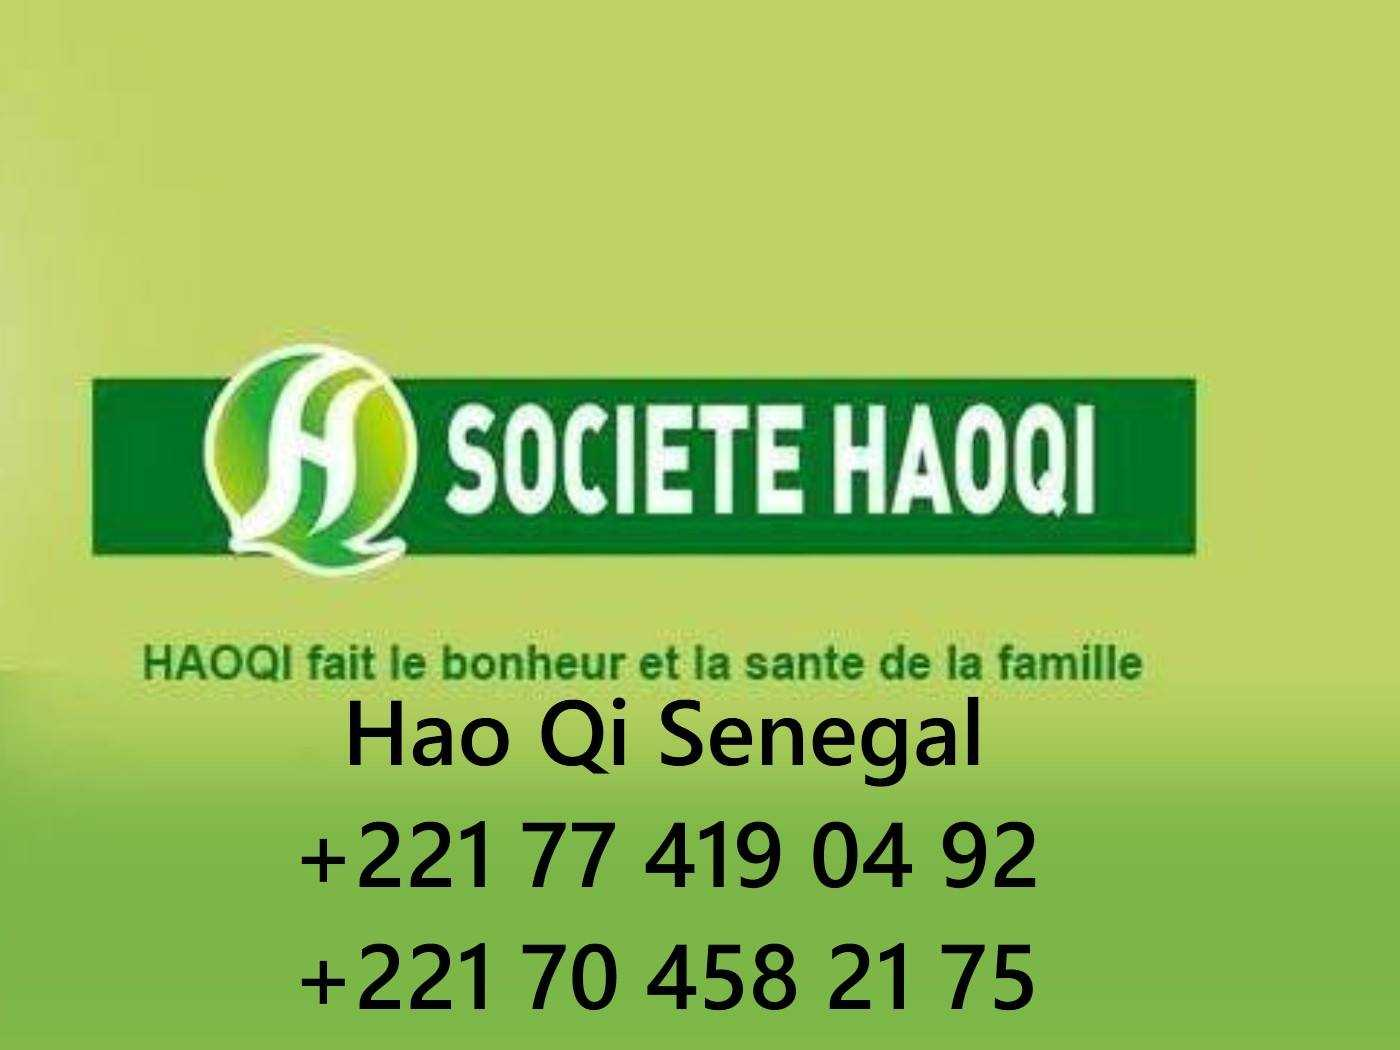 Hao Qi Senegal Profile Picture